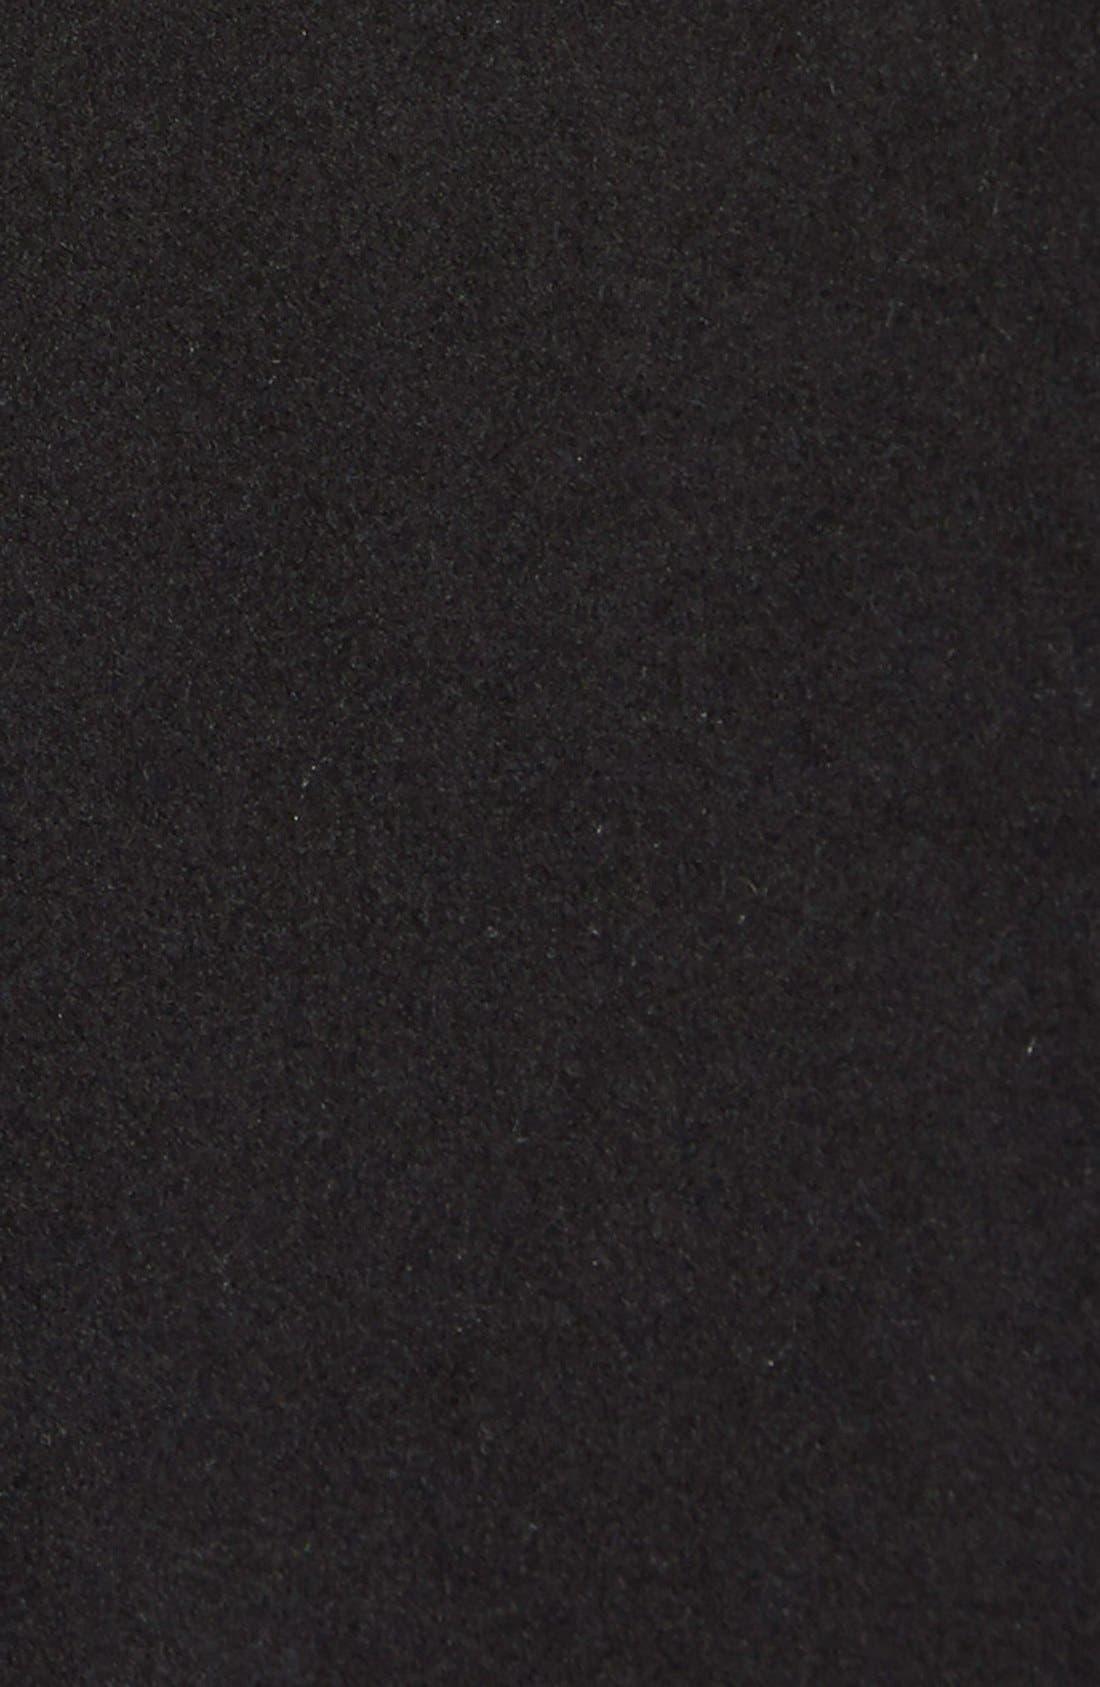 Faux Leather & Faux Fur Trim Belted Wool Blend Coat,                             Alternate thumbnail 13, color,